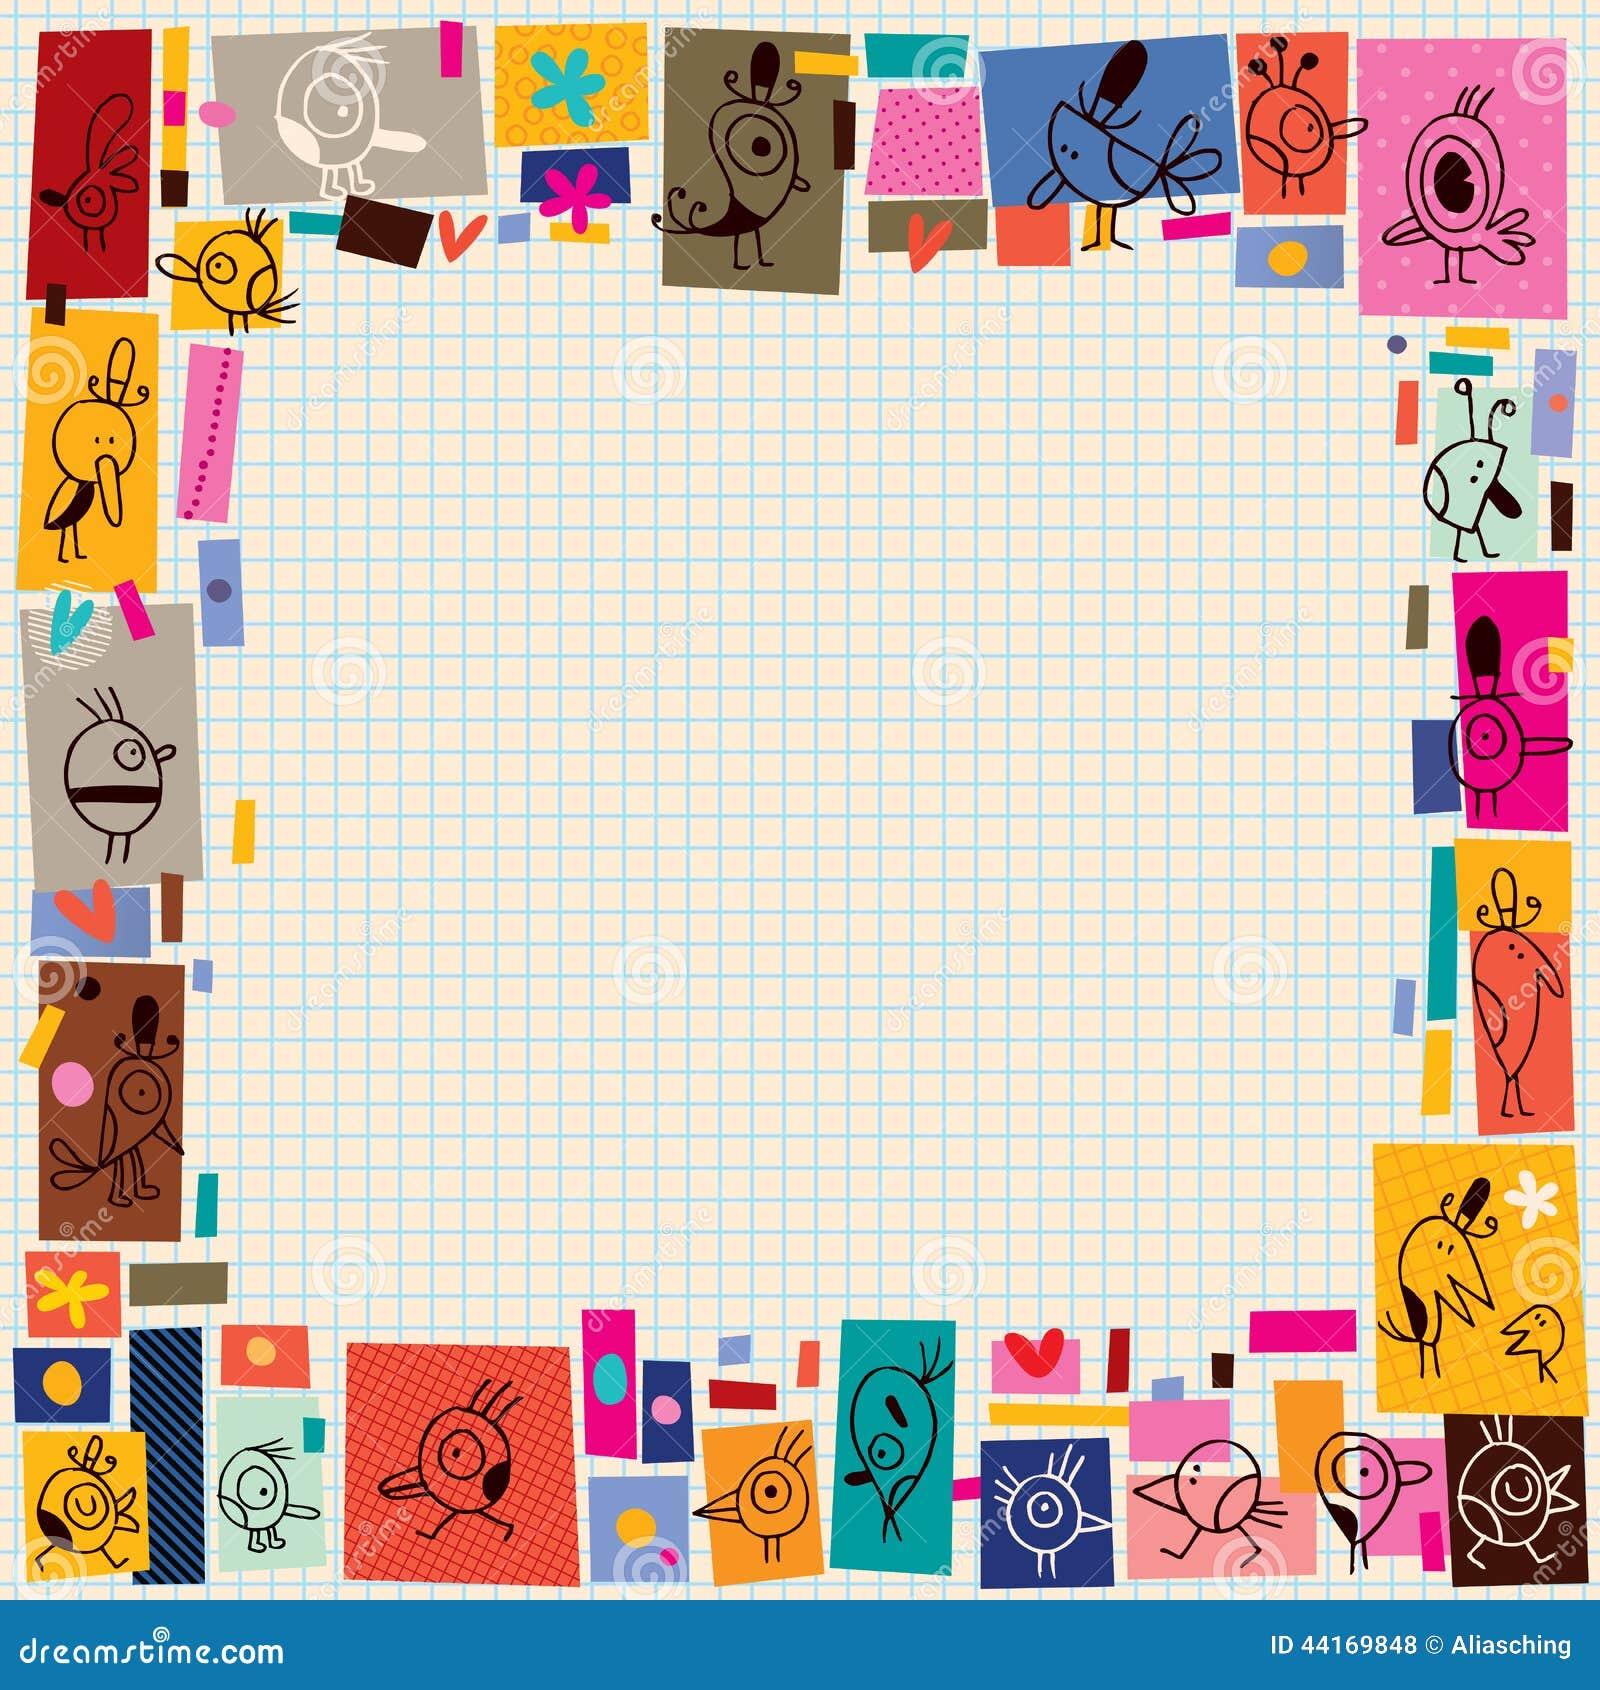 Cartoon Character Border Design : Cute birds collage cartoon doodle border stock vector